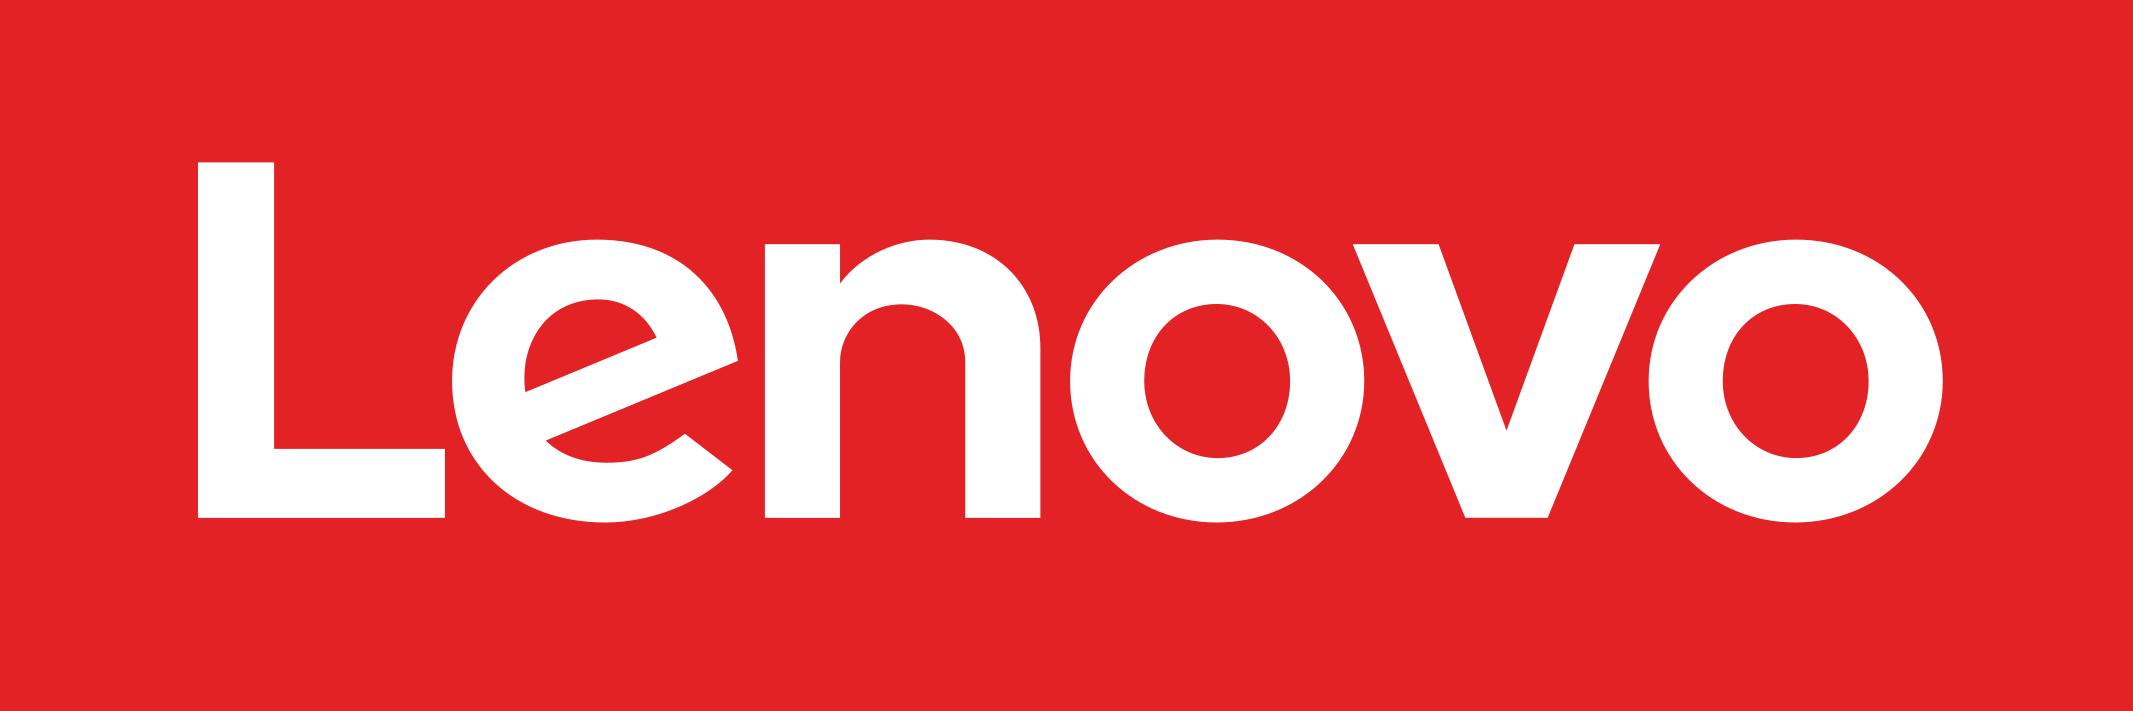 LenovoLogo-POS-Red(1)